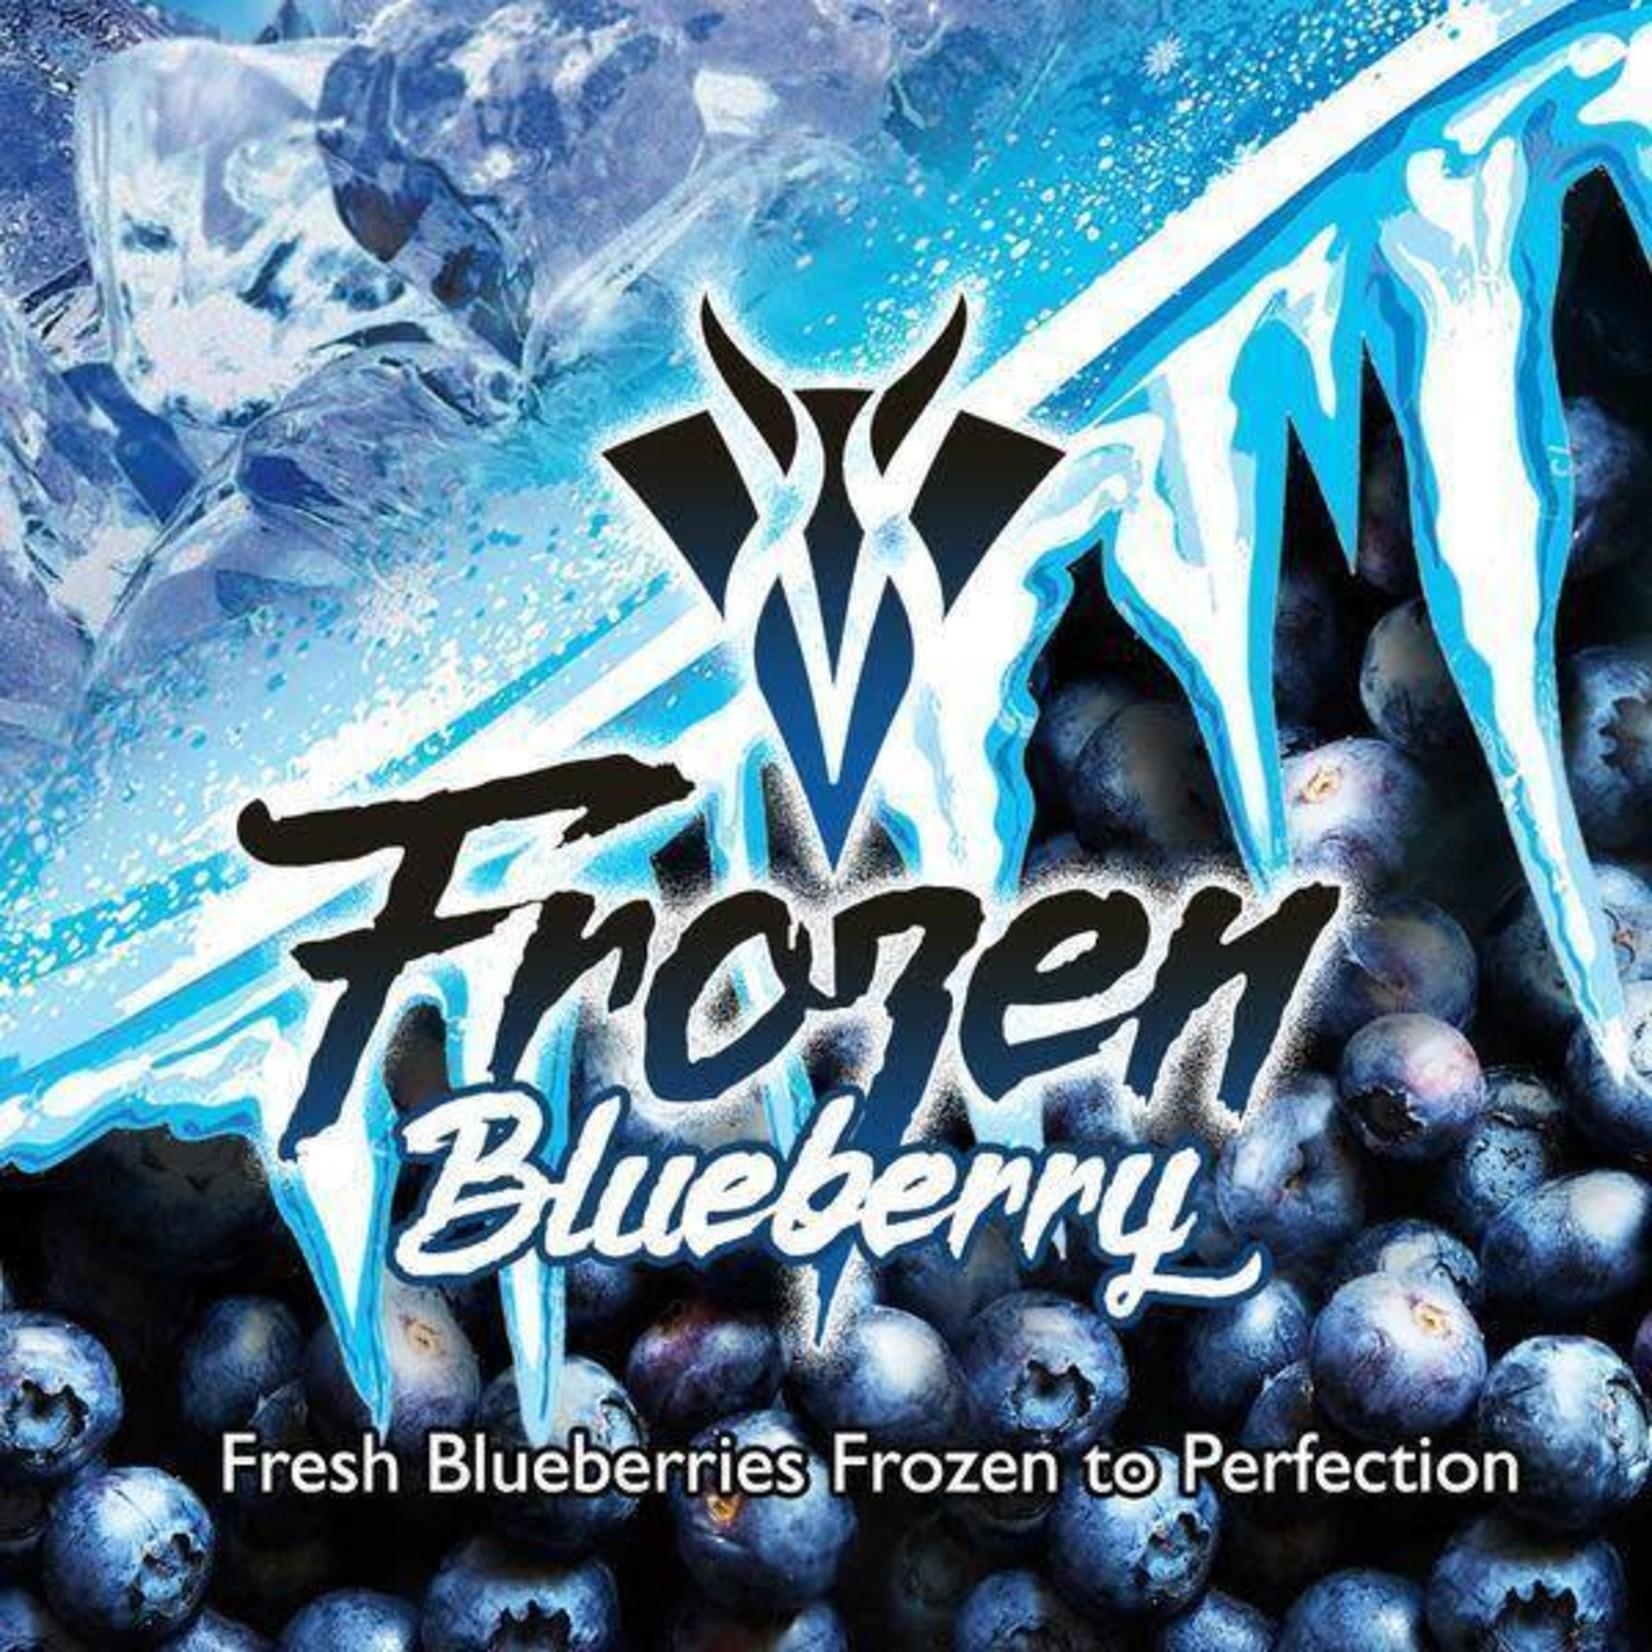 Vango Frozen Blueberry